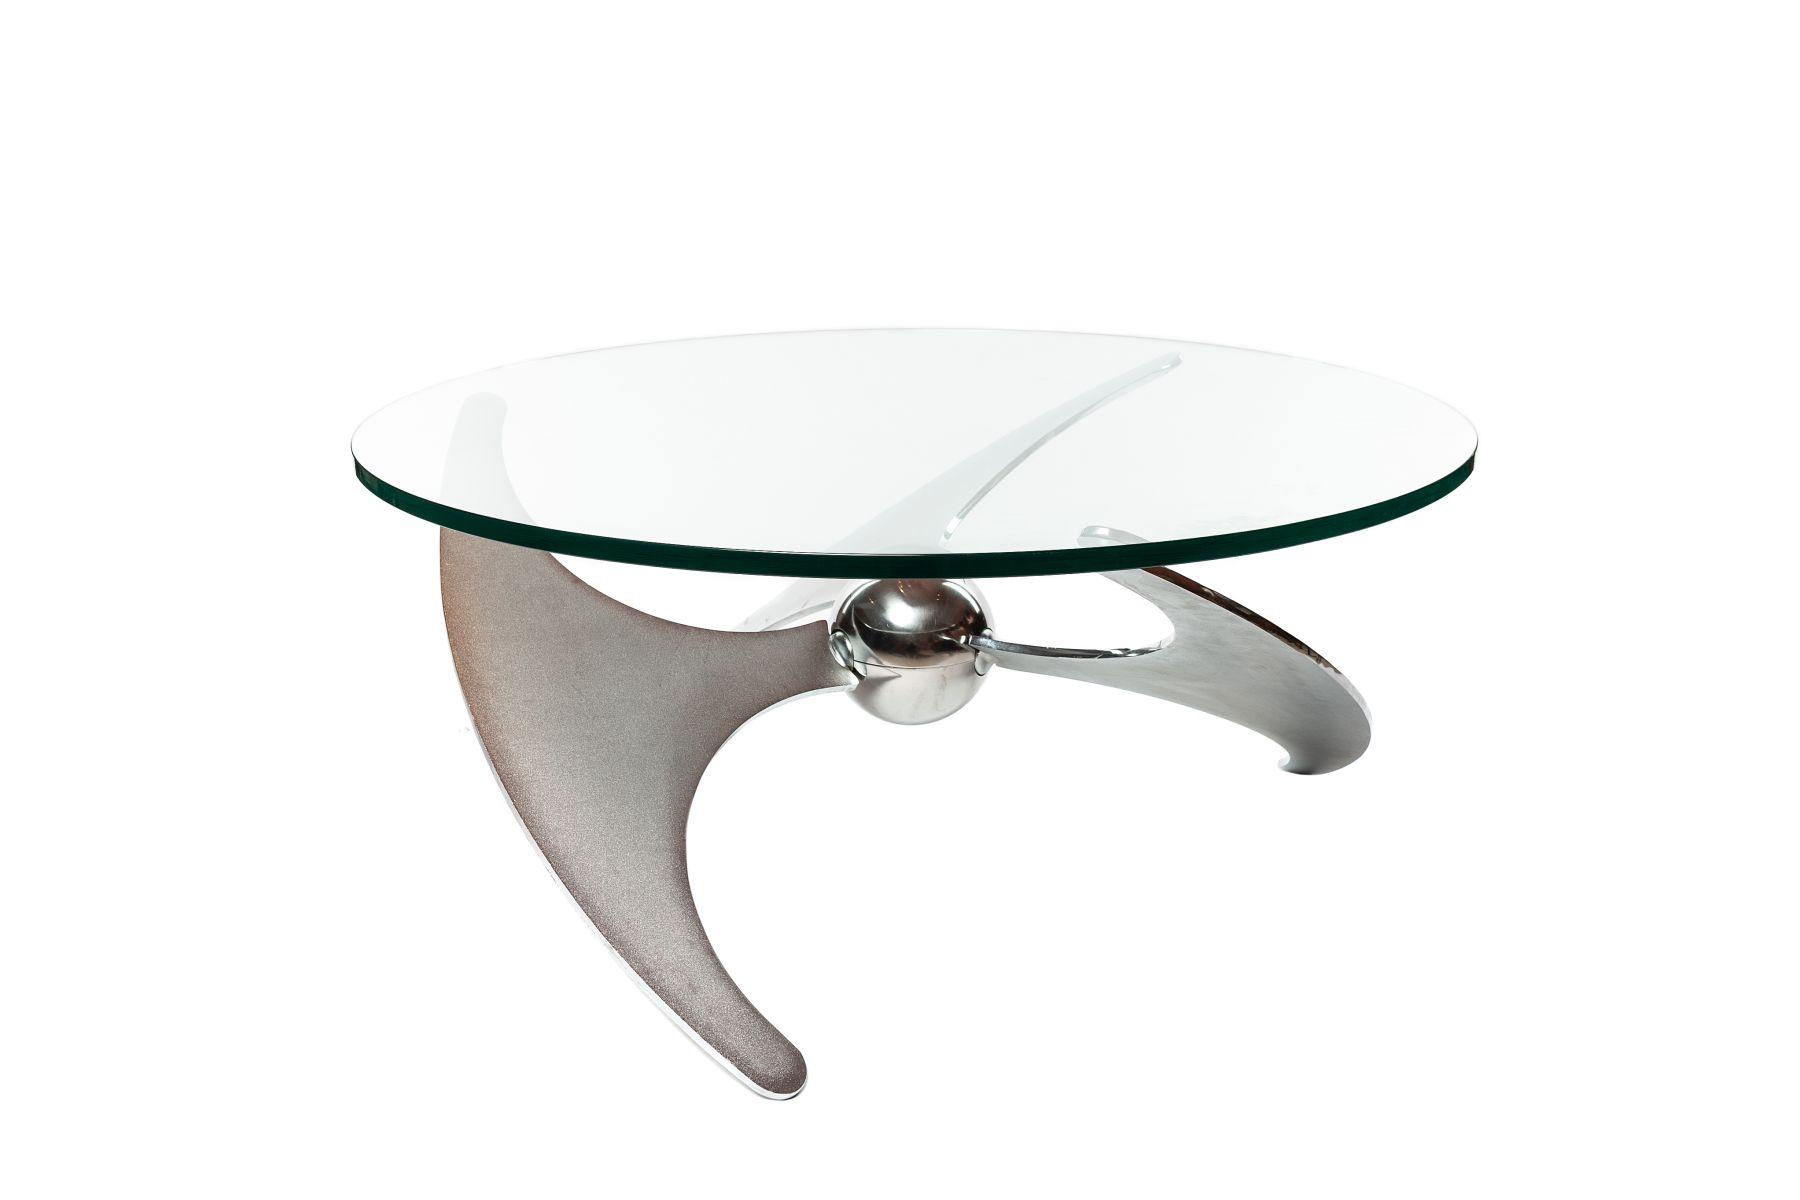 "#9 Luciano Campanini for Cama, ""Propeller Table"" | Luciano Campanini für Cama, ""Propellertisch"" Image"